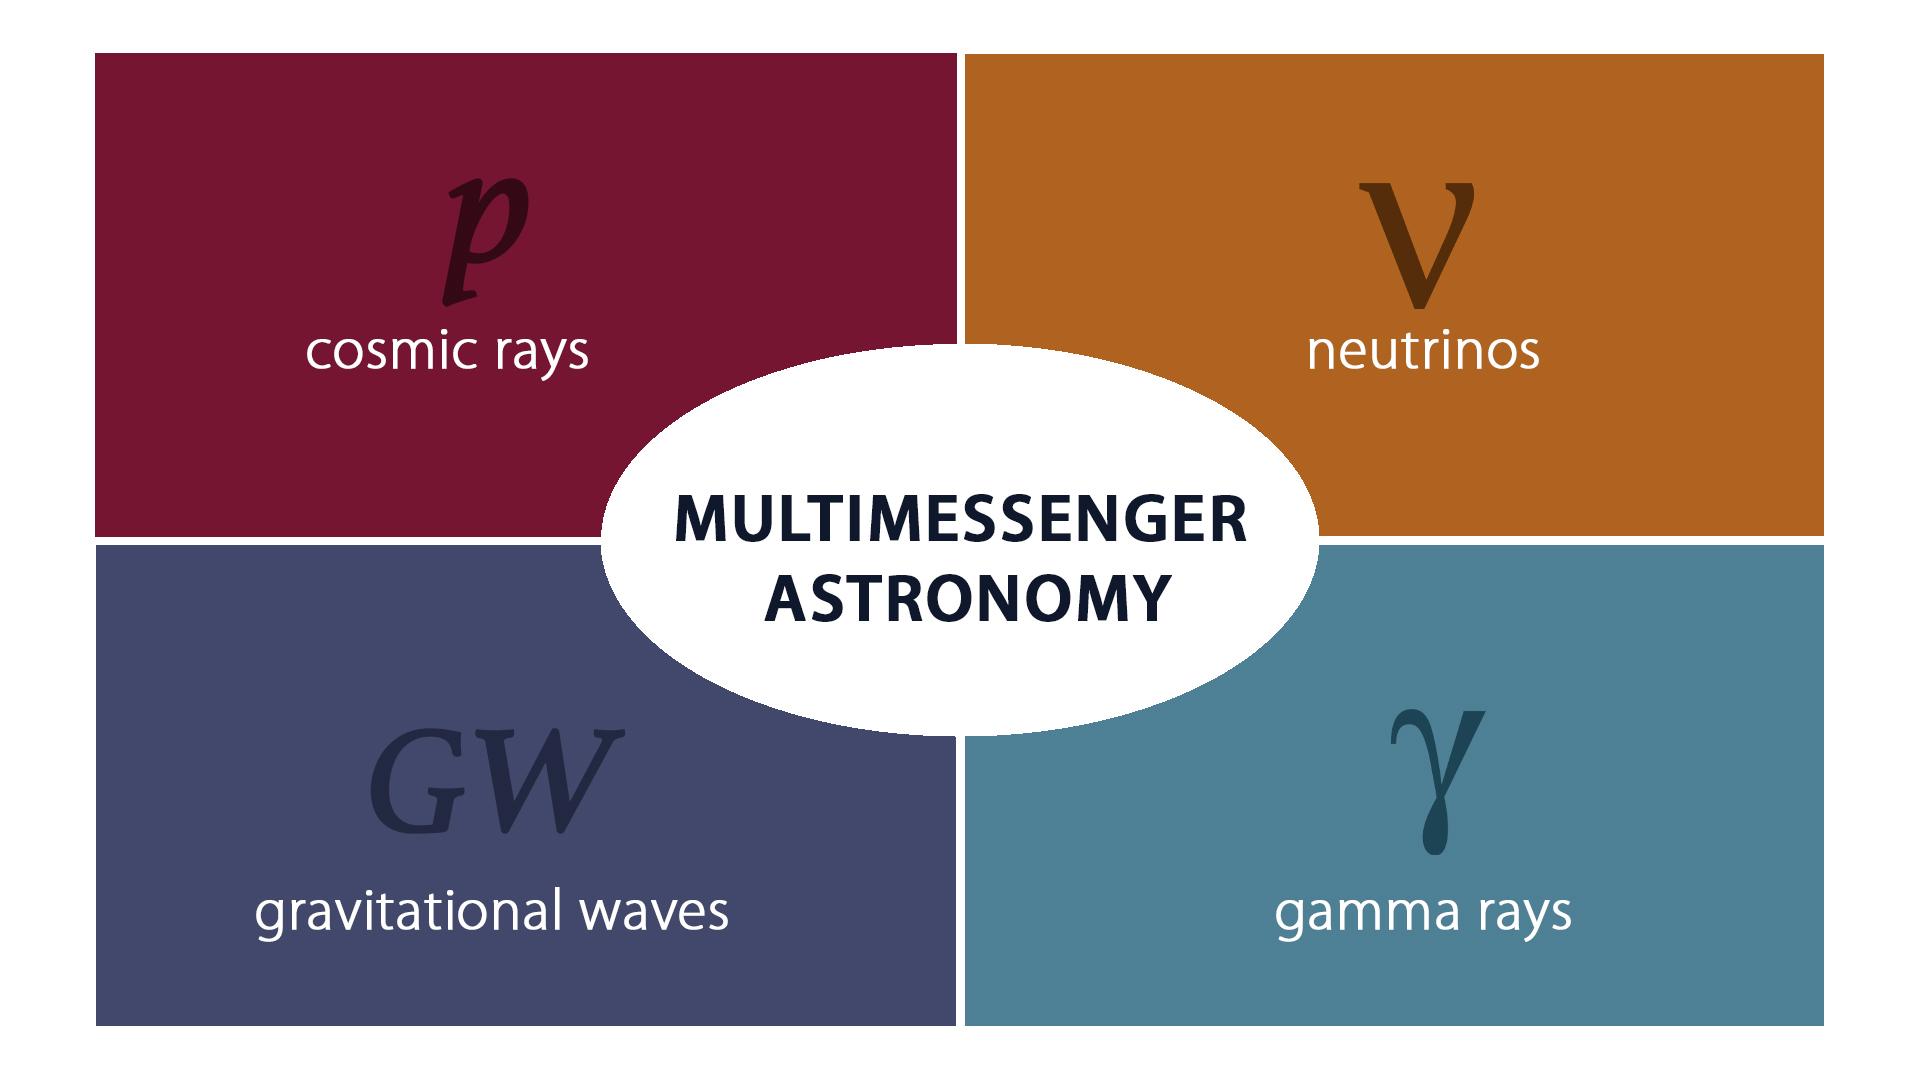 Four messengers